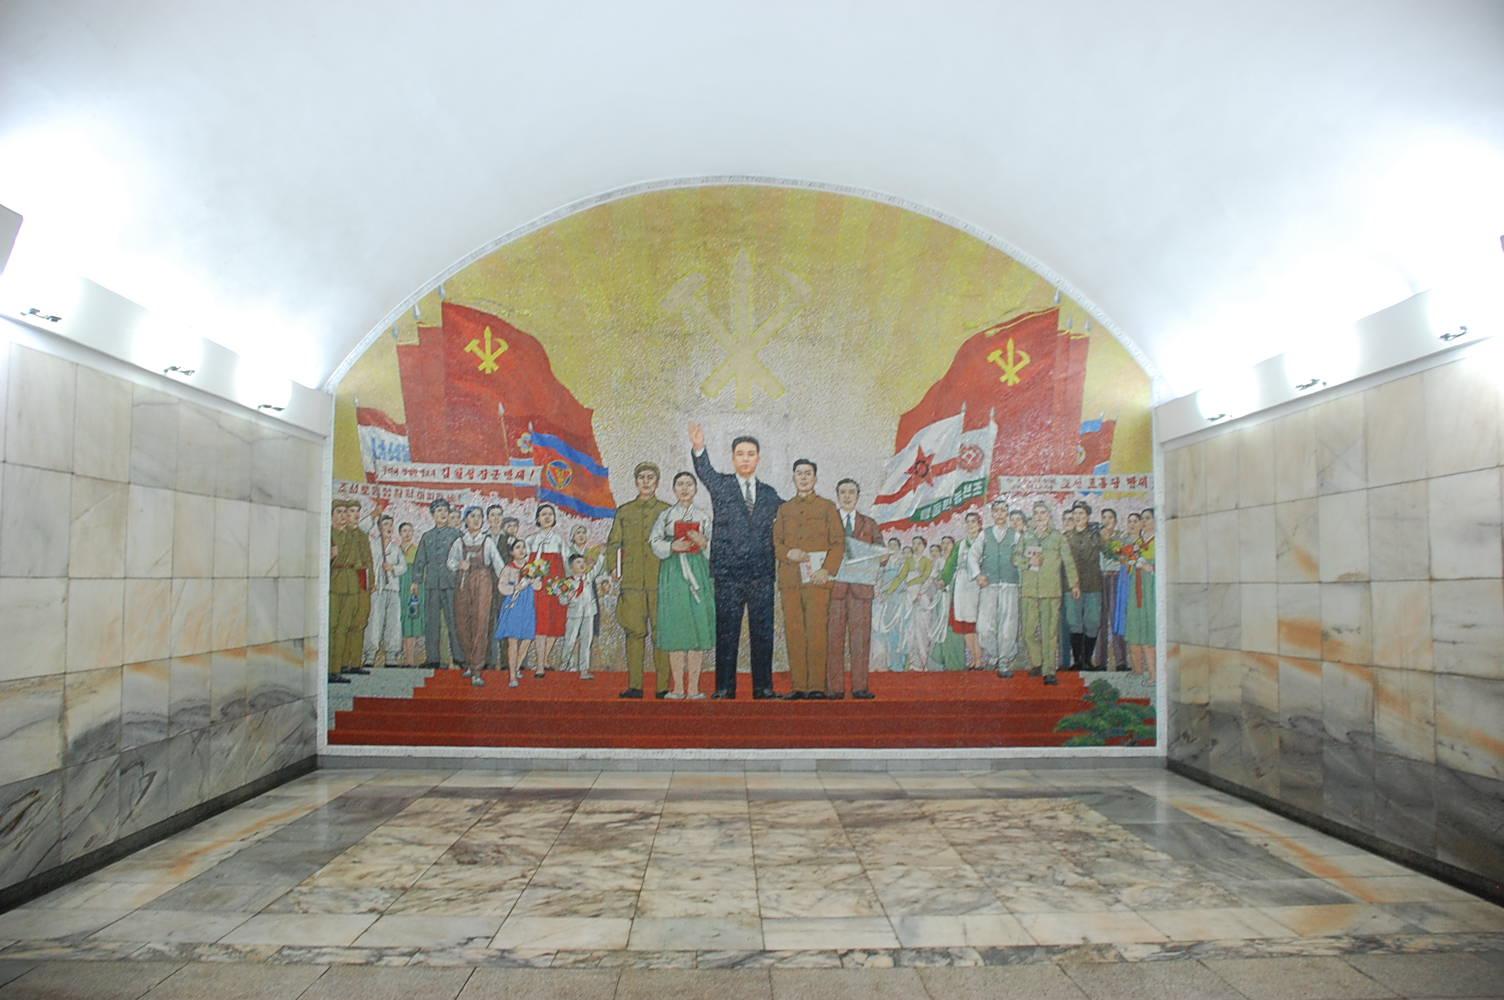 Северокорейское метро, автор: (stephan), лицензия: CC BY SA 2.0 [(cc) Wikipedia.org]